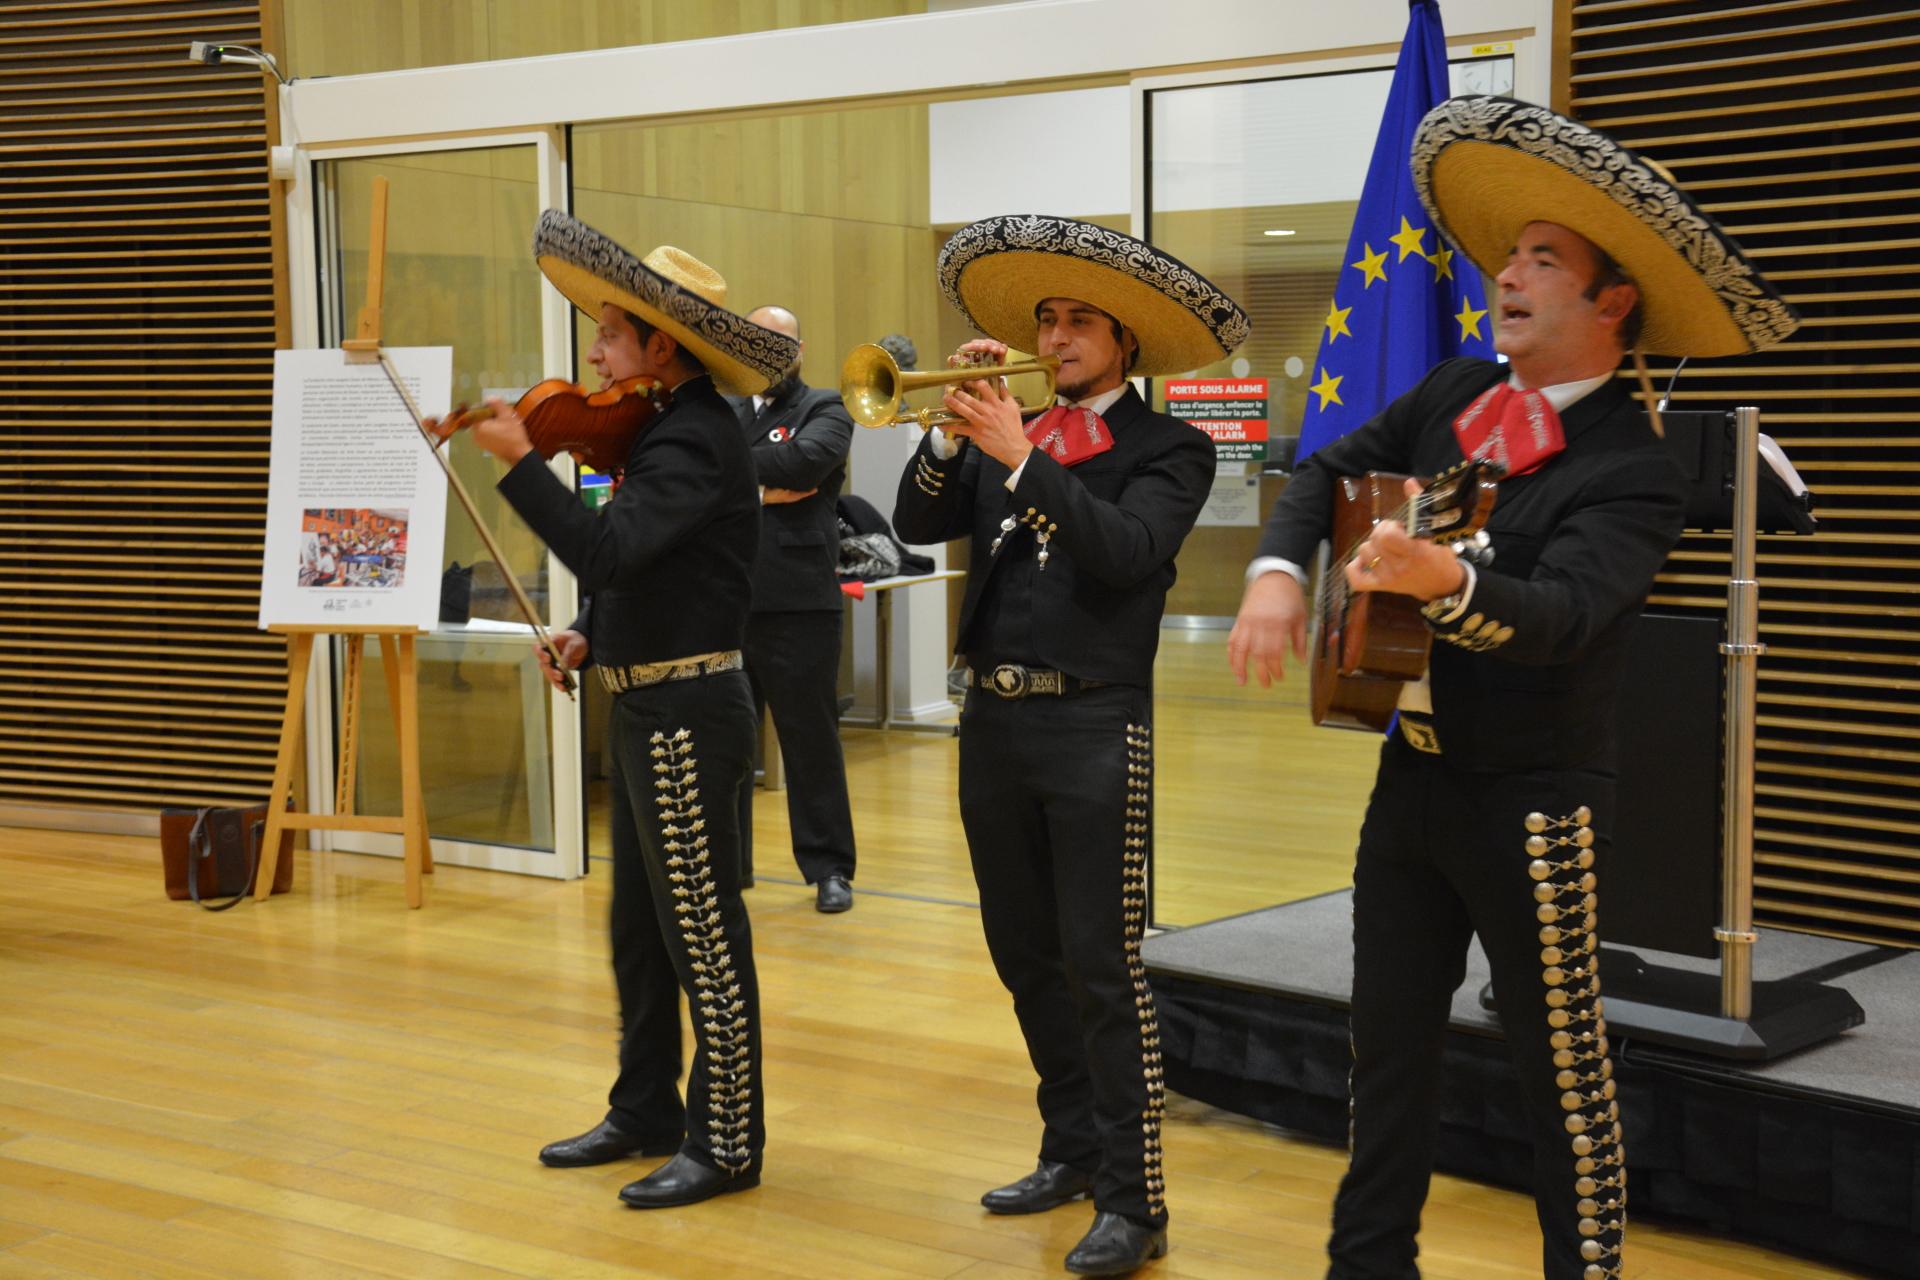 Música mexicana amenizó el evento